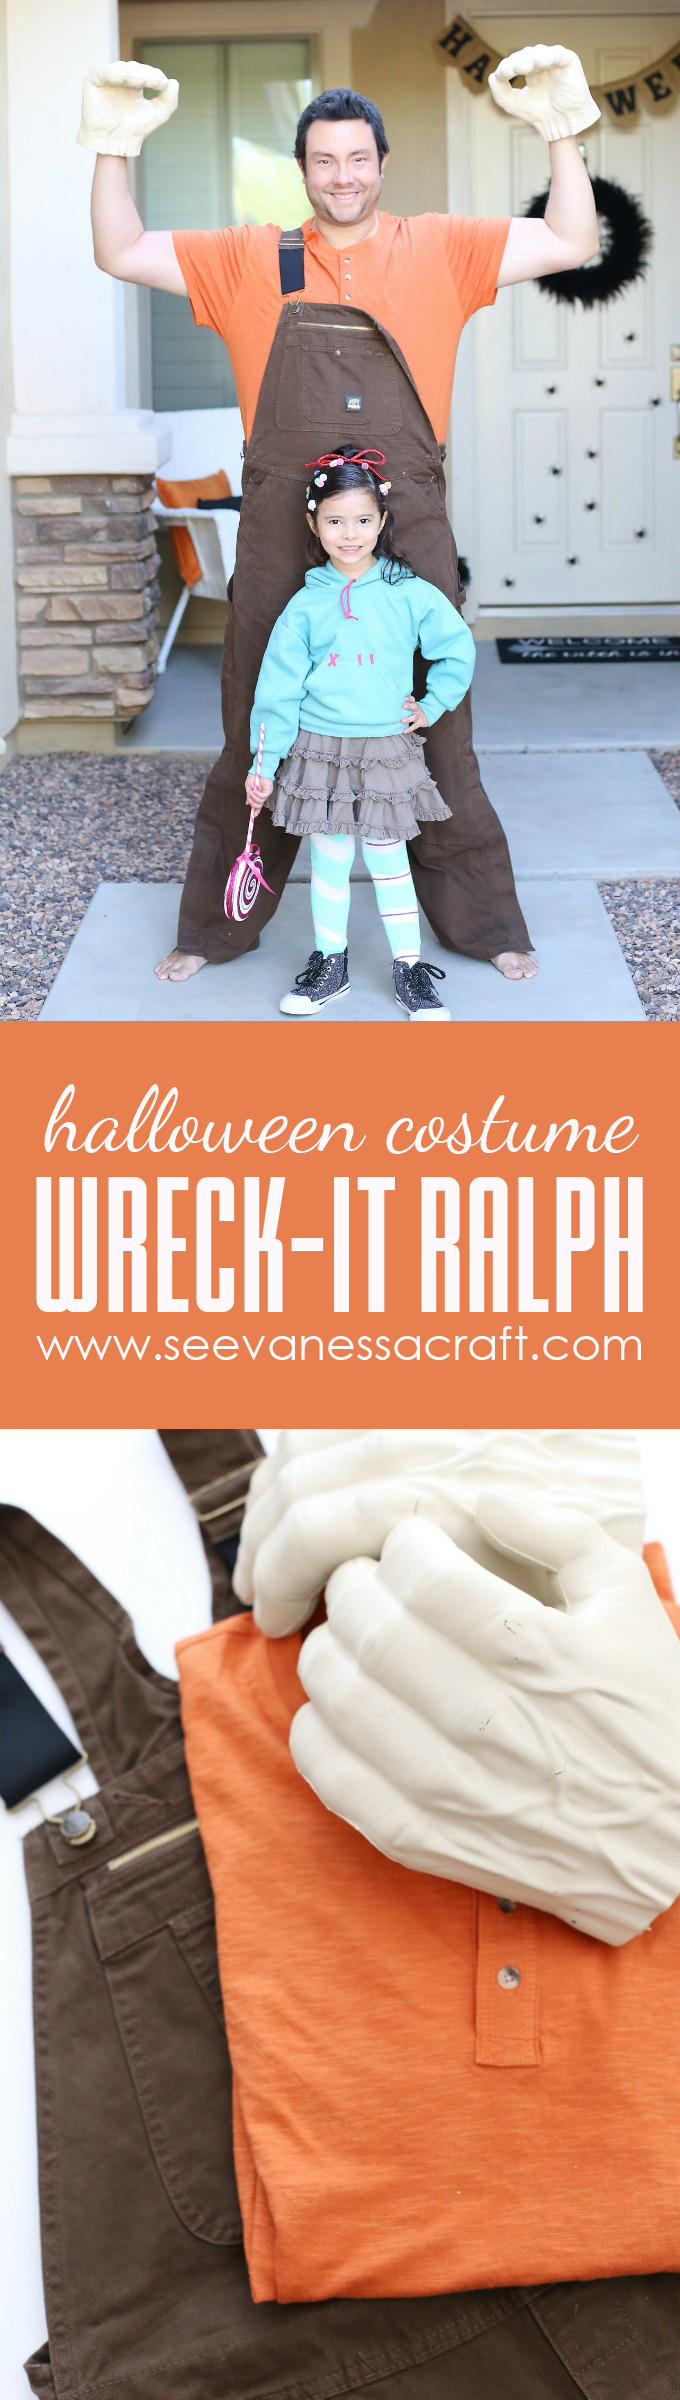 Wreck It Ralph Halloween Costume Tutorial